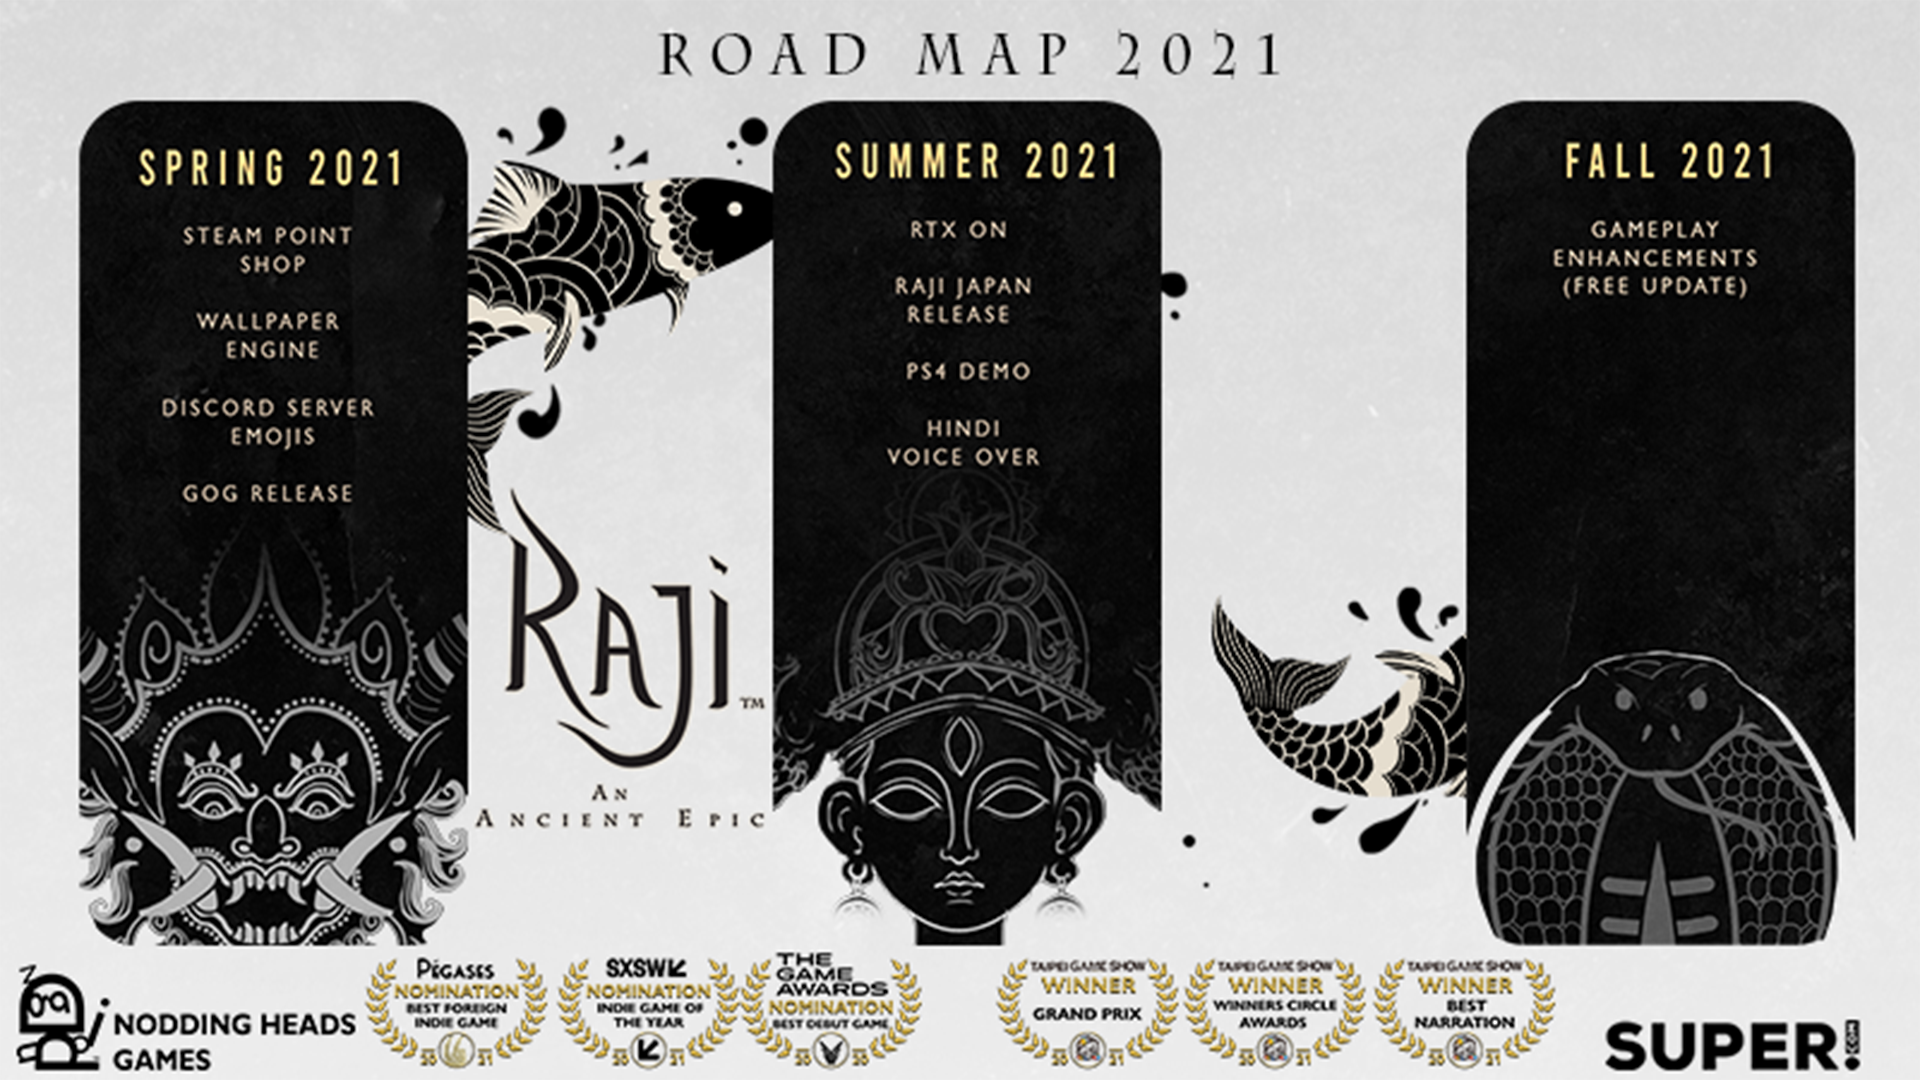 Raji: An Ancient Epic 2021 Roadmap